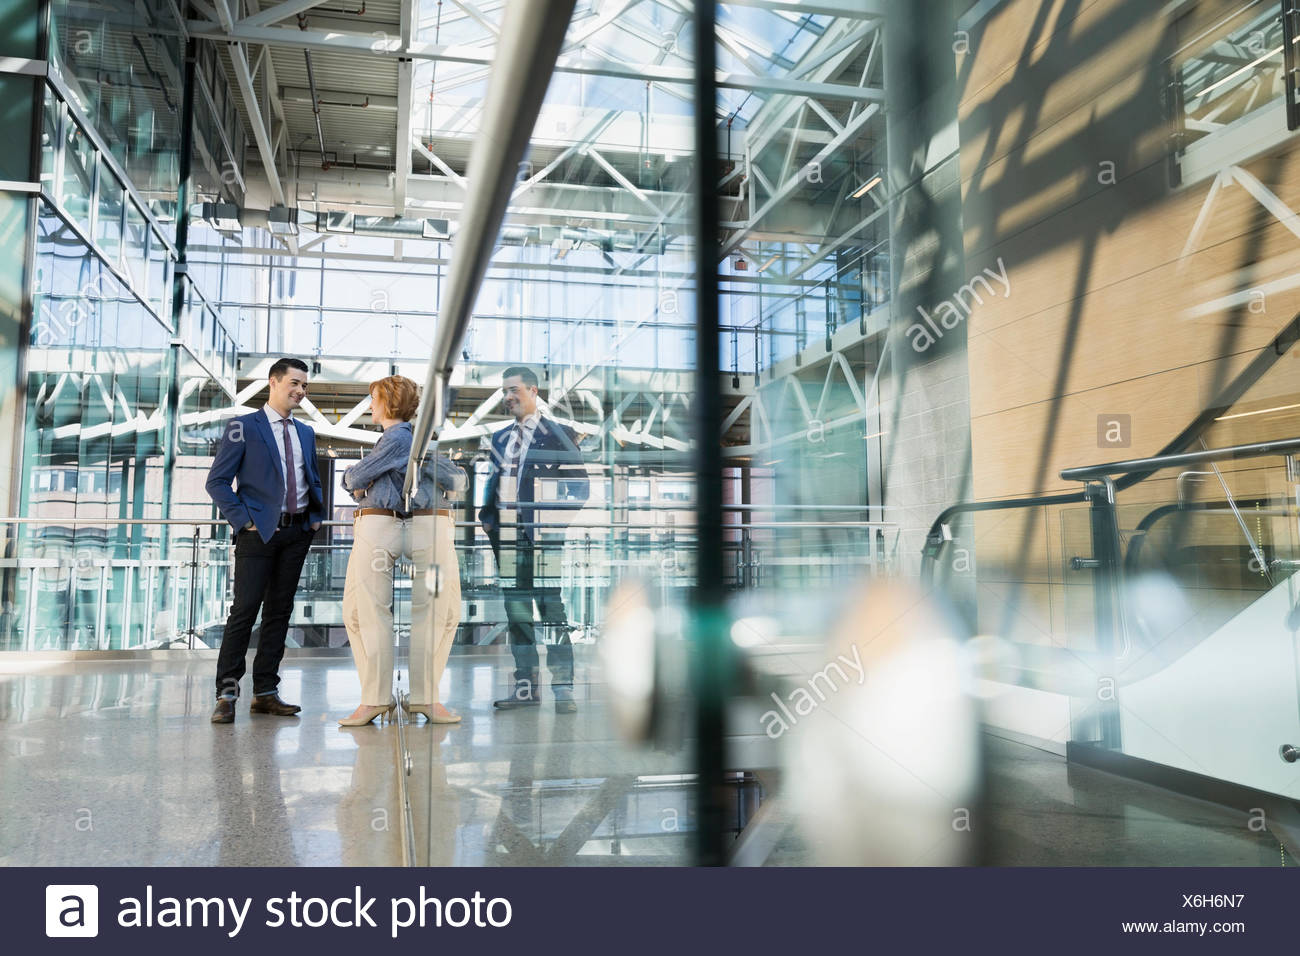 Business people talking in atrium - Stock Image